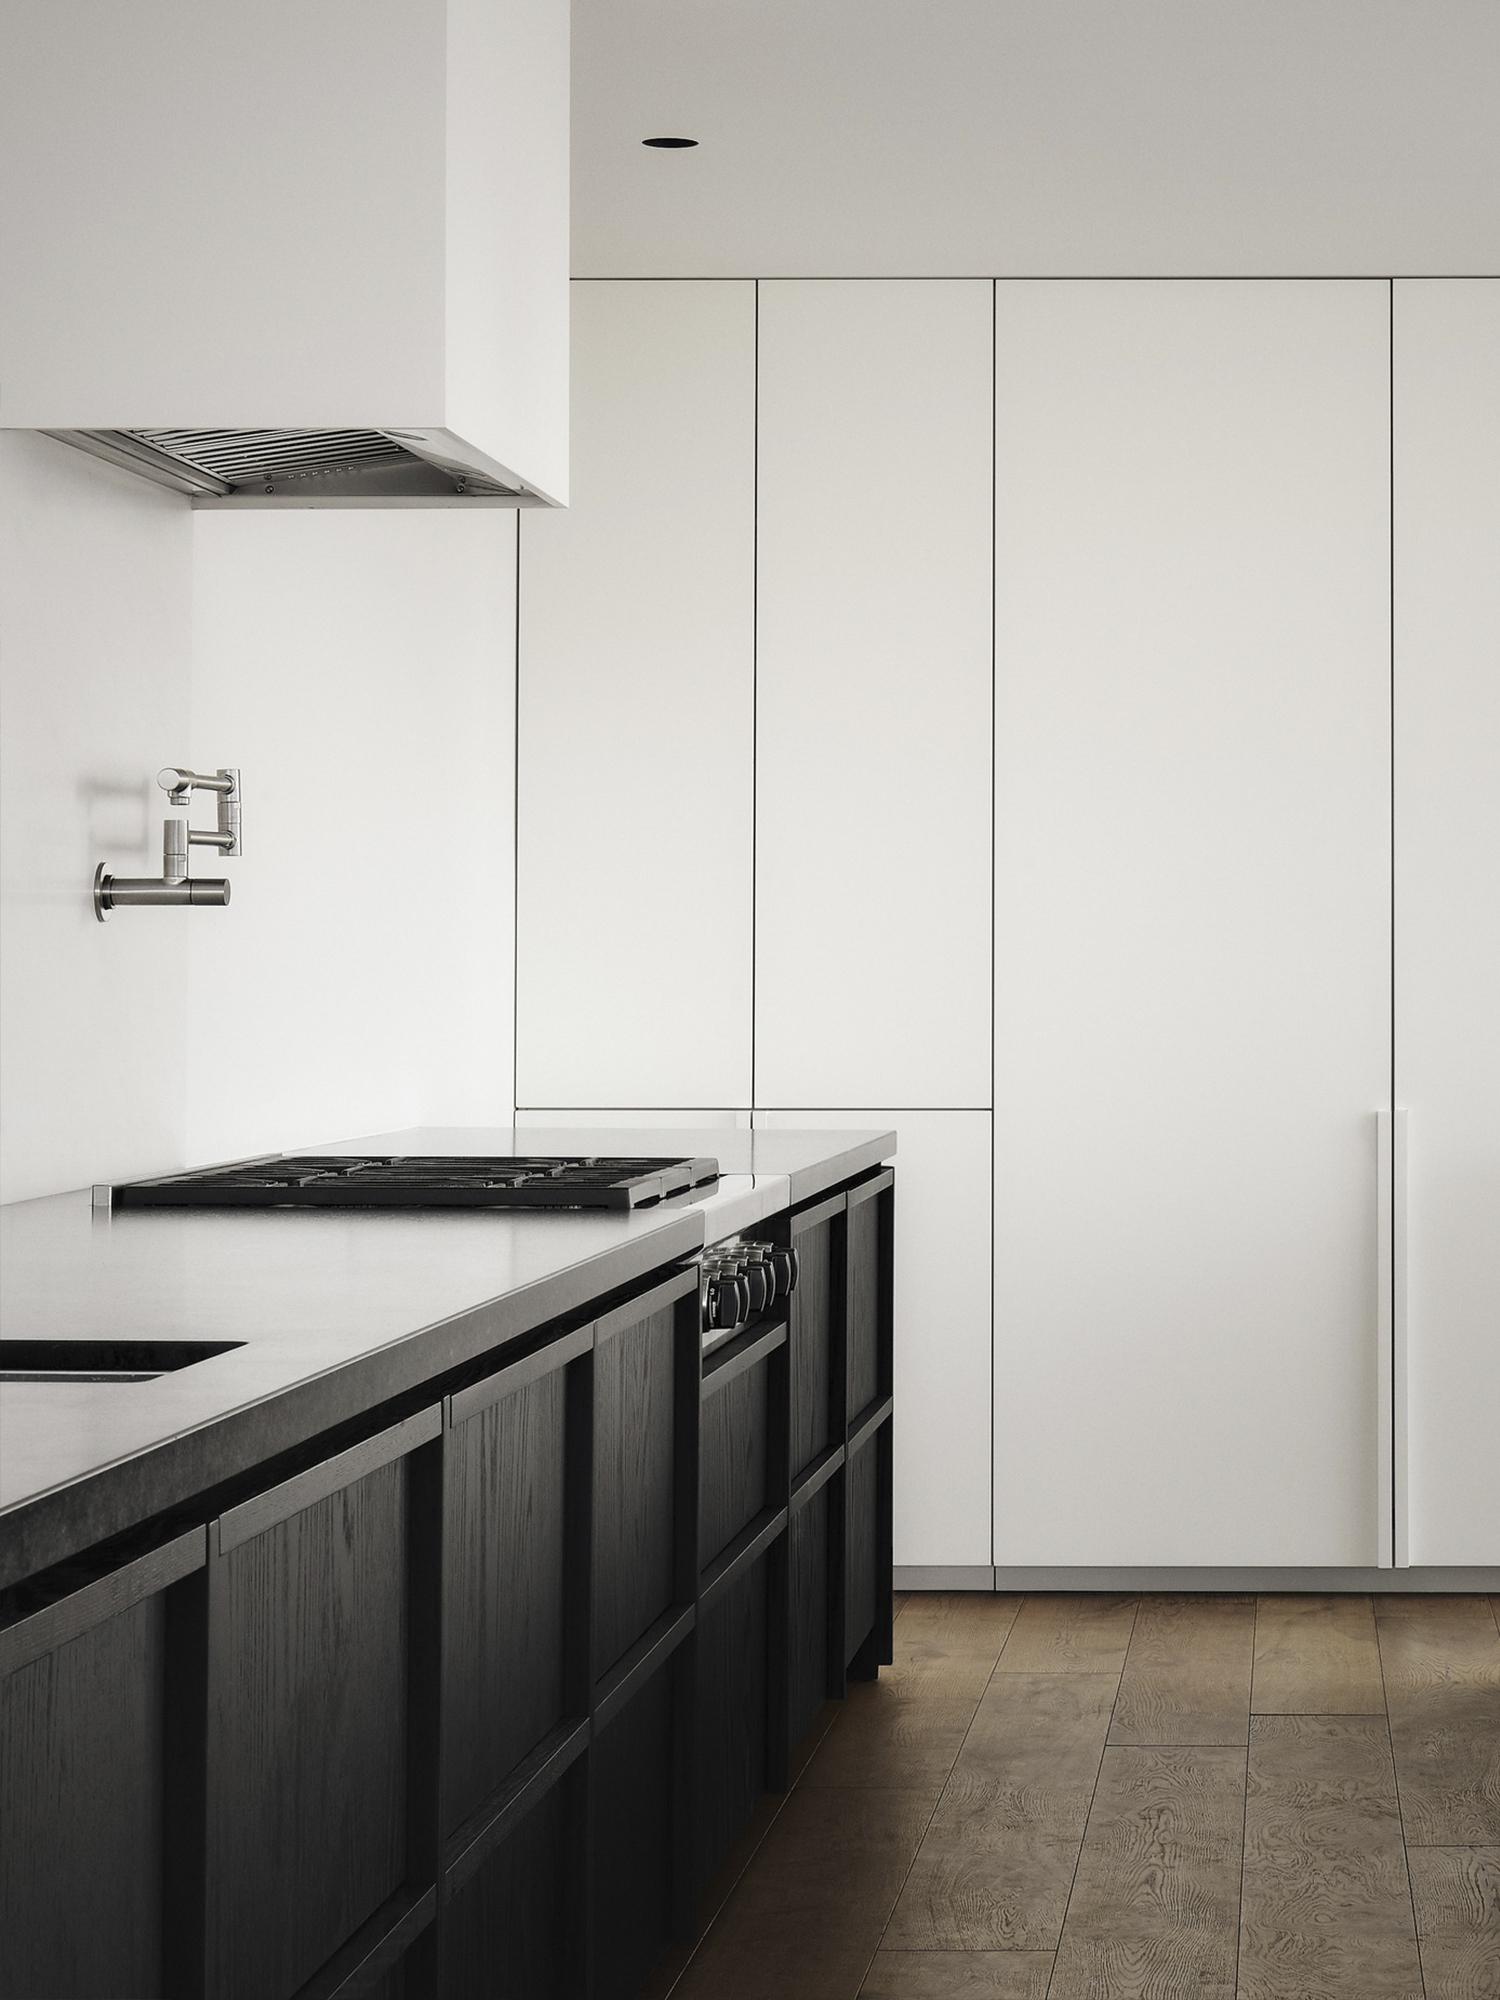 est living Alma House Atelier Barda Architects 10